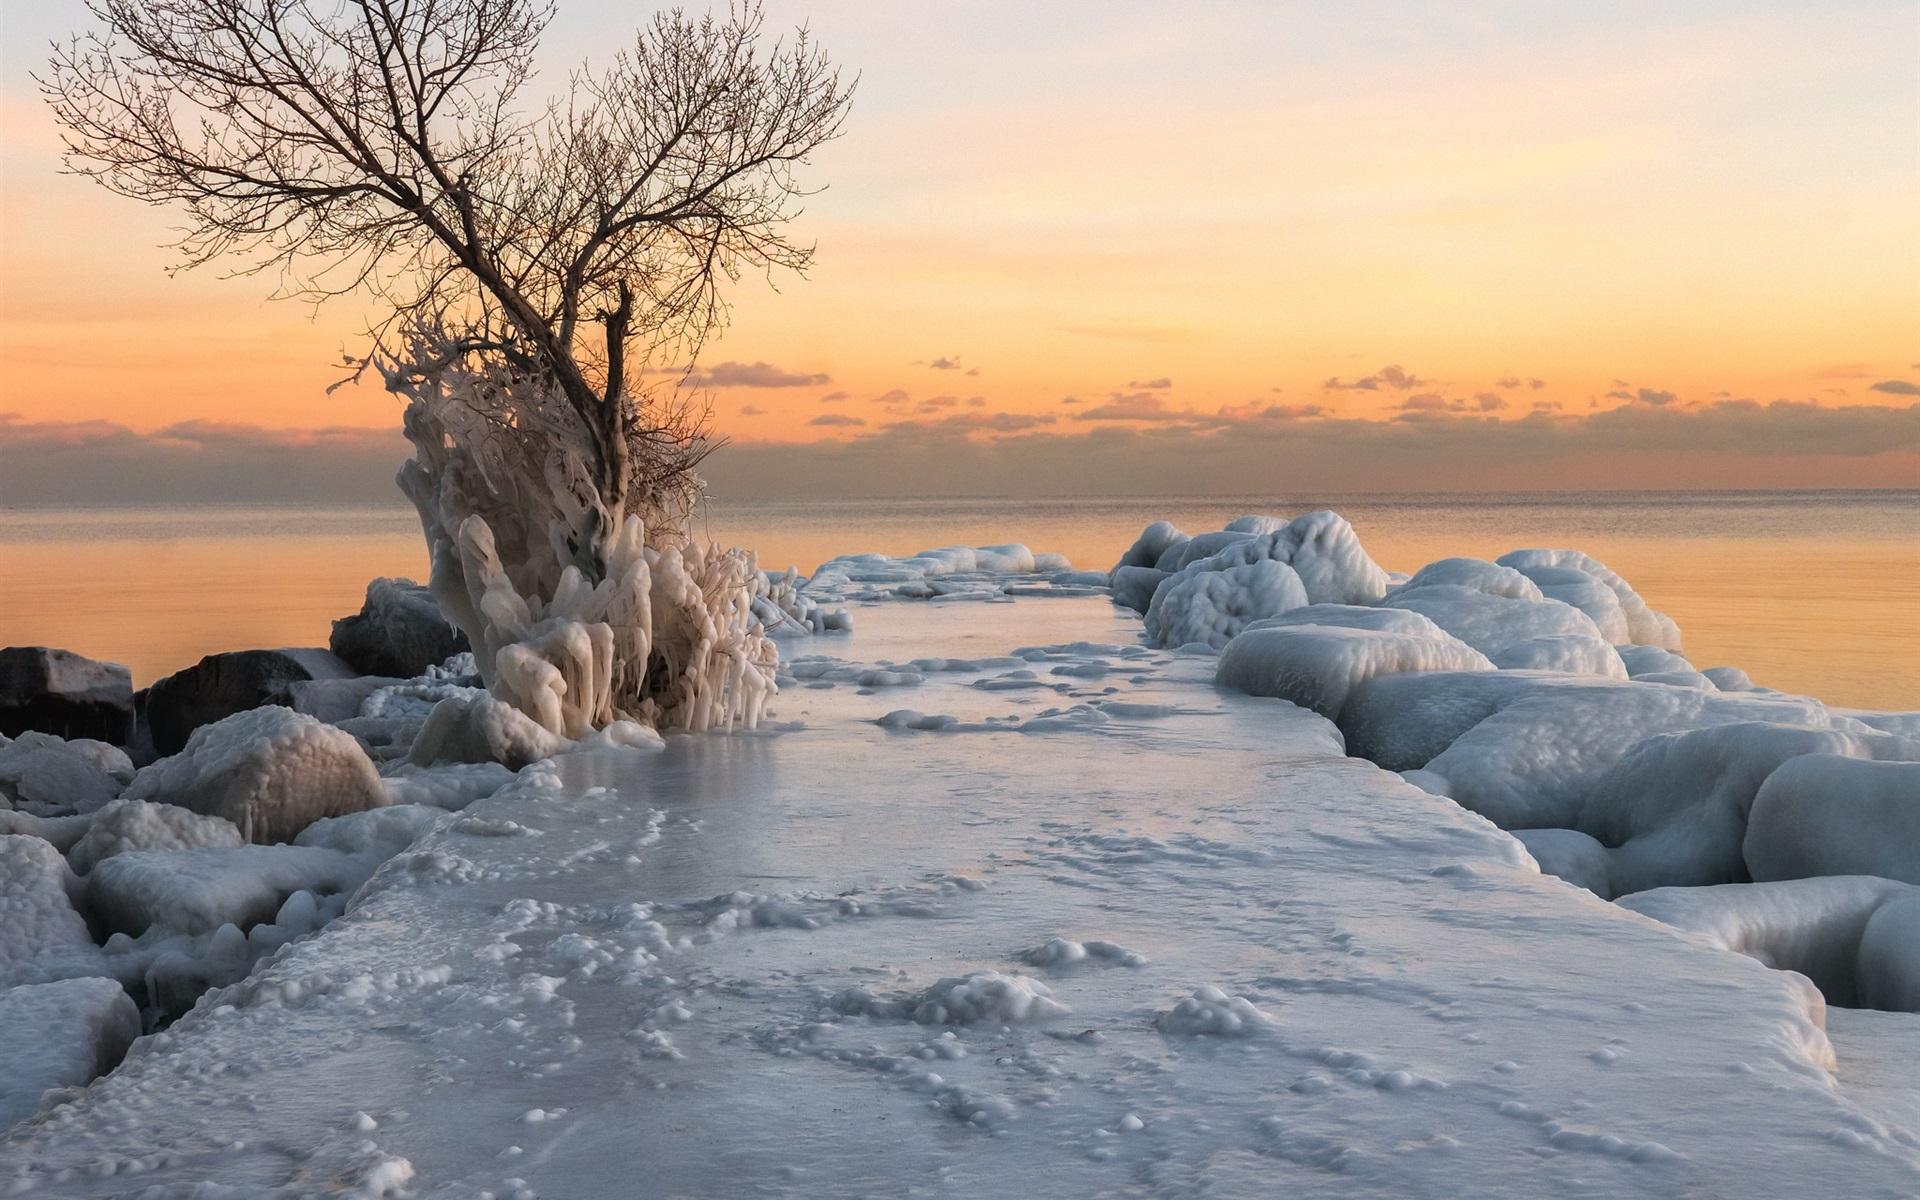 Море зимой картинка